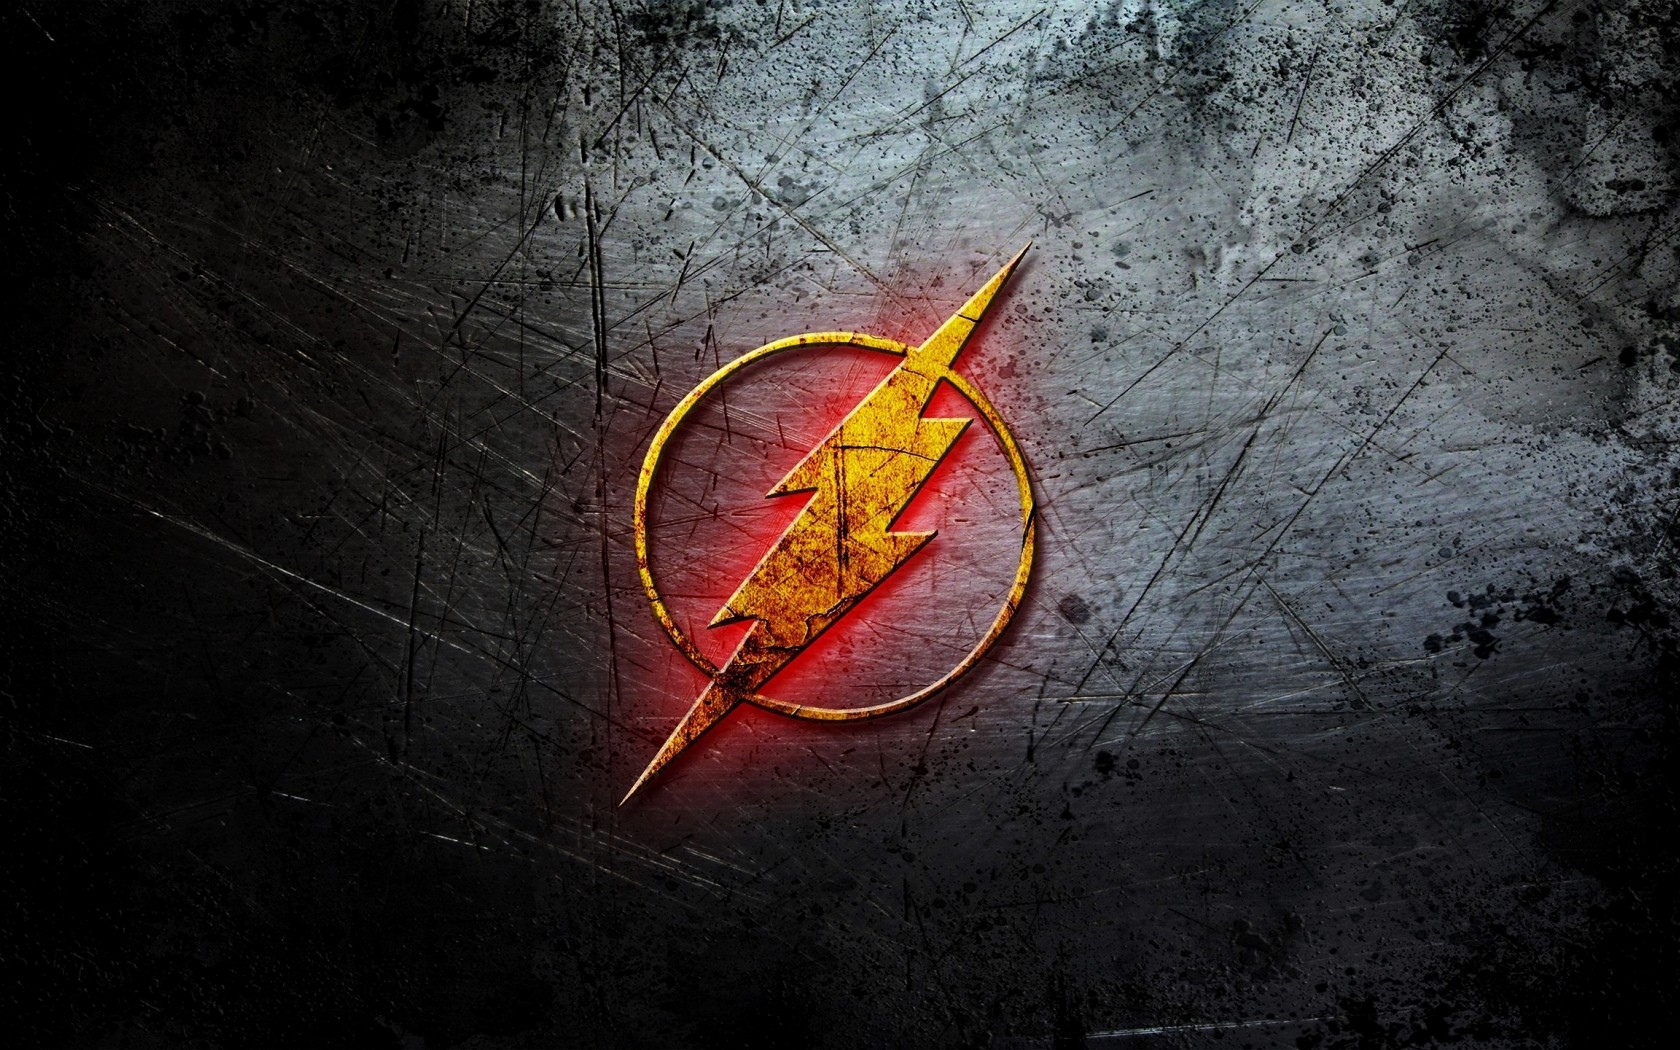 logo The Flash logo HD wallpaper 1680x1050